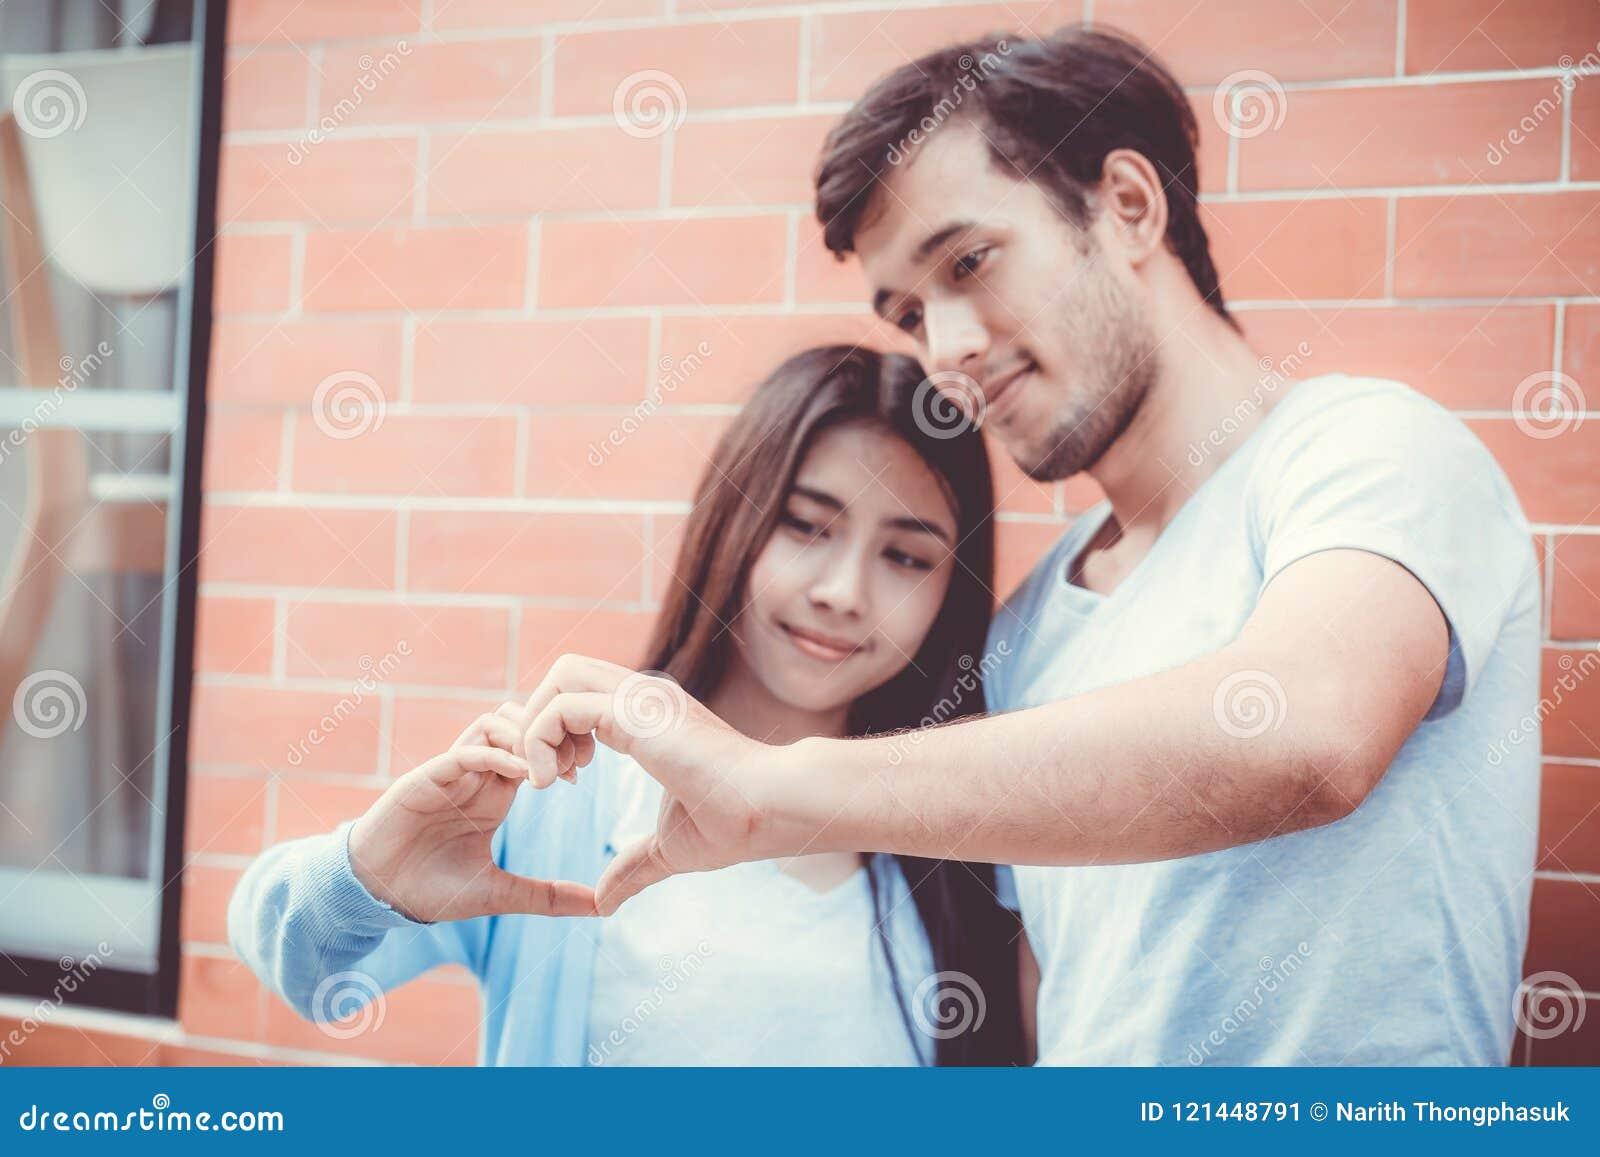 asiatico single dating UK buone linee introduttive per siti di incontri